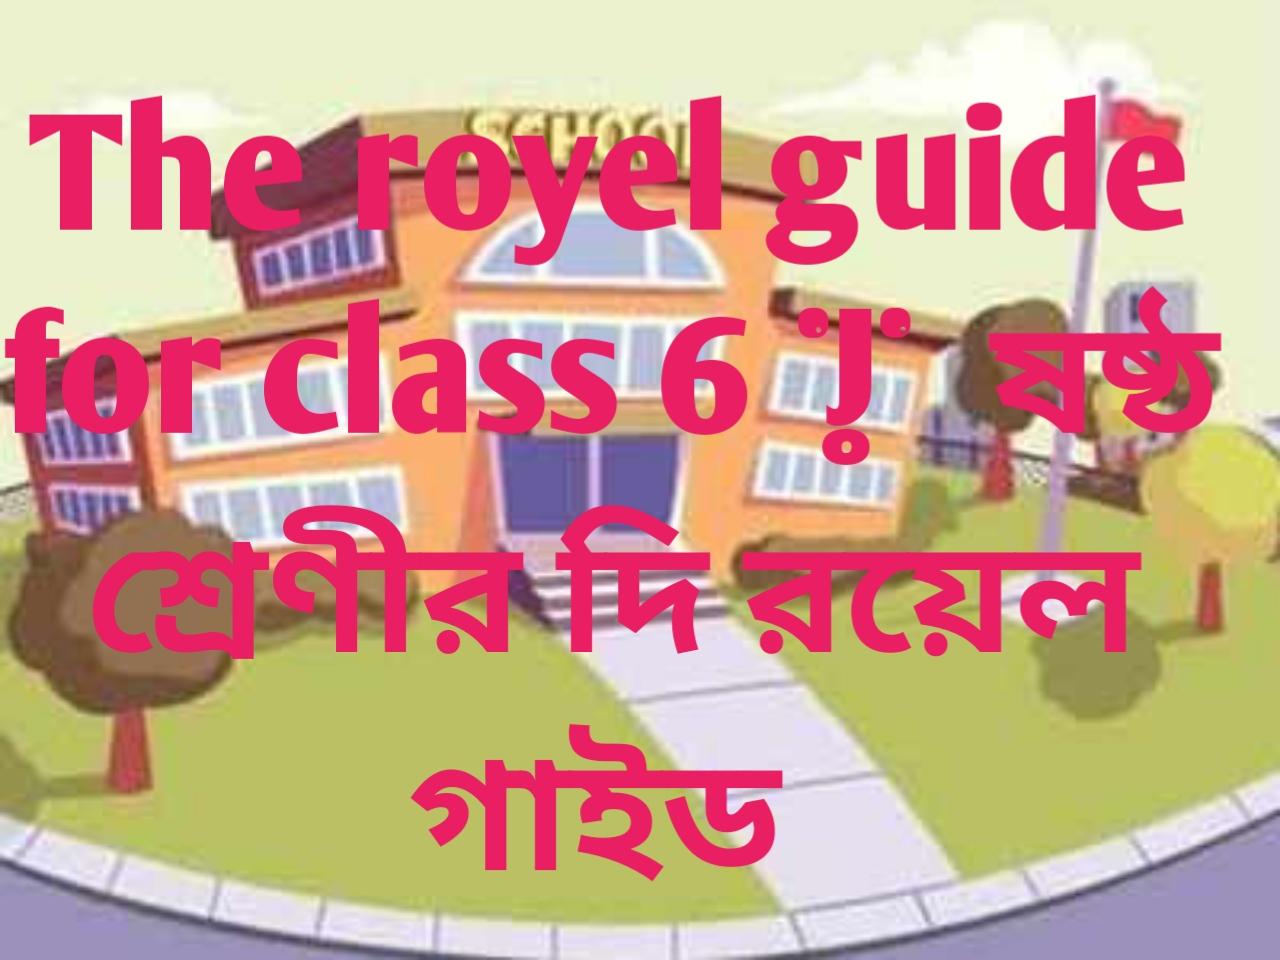 class 6 the royel guide 2021, class 6 the royel guide pdf, class 6 the royel guide book 2021, class 6 math solution the royel guide, the royel guide class 6, the royel guide for class 6, the royel guide for class 6 english, the royel guide for class  math, the royel guide for class 6 science, the royel guide for class 6 Bangladesh and global studies, the royel guide for class 6, the royel guide for class 6 hindu dharma, the royel guide for class 6 ICT, the royel guide for class 6 home science, the royel guide for class 6 agriculture education, the royel guide for class 6 physical education, ষষ্ট শ্রেণীর বাংলা দি রয়েল গাইড ডাউনলোড, ষষ্ট শ্রেণীর বাংলা গাইড এর পিডিএফ, ষষ্ট শ্রেণির বাংলা দি রয়েল গাইড পিডিএফ ২০২১, ষষ্ট শ্রেণীর দি রয়েল গাইড ২০২১, ষষ্ট শ্রেণির ইংরেজি দি রয়েল গাইড, ষষ্ট শ্রেণীর গণিত দি রয়েল গাইড, ষষ্ট শ্রেণীর দি রয়েল গাইড বিজ্ঞান, ষষ্ট শ্রেণীর দি রয়েল গাইড বাংলাদেশ ও বিশ্বপরিচয়, ষষ্ট শ্রেণীর দি রয়েল গাইড ইসলাম শিক্ষা, ষষ্ট শ্রেণীর দি রয়েল গাইড হিন্দুধর্ম, ষষ্ট শ্রেণীর দি রয়েল গাইড গার্হস্থ্য বিজ্ঞান, ষষ্ট শ্রেণীর দি রয়েল গাইড কৃষি শিক্ষা, ষষ্ট শ্রেণীর দি রয়েল গাইড তথ্য যোগাযোগ প্রযুক্তি, ষষ্ট শ্রেণীর দি রয়েল গাইড শারীরিক শিক্ষা,